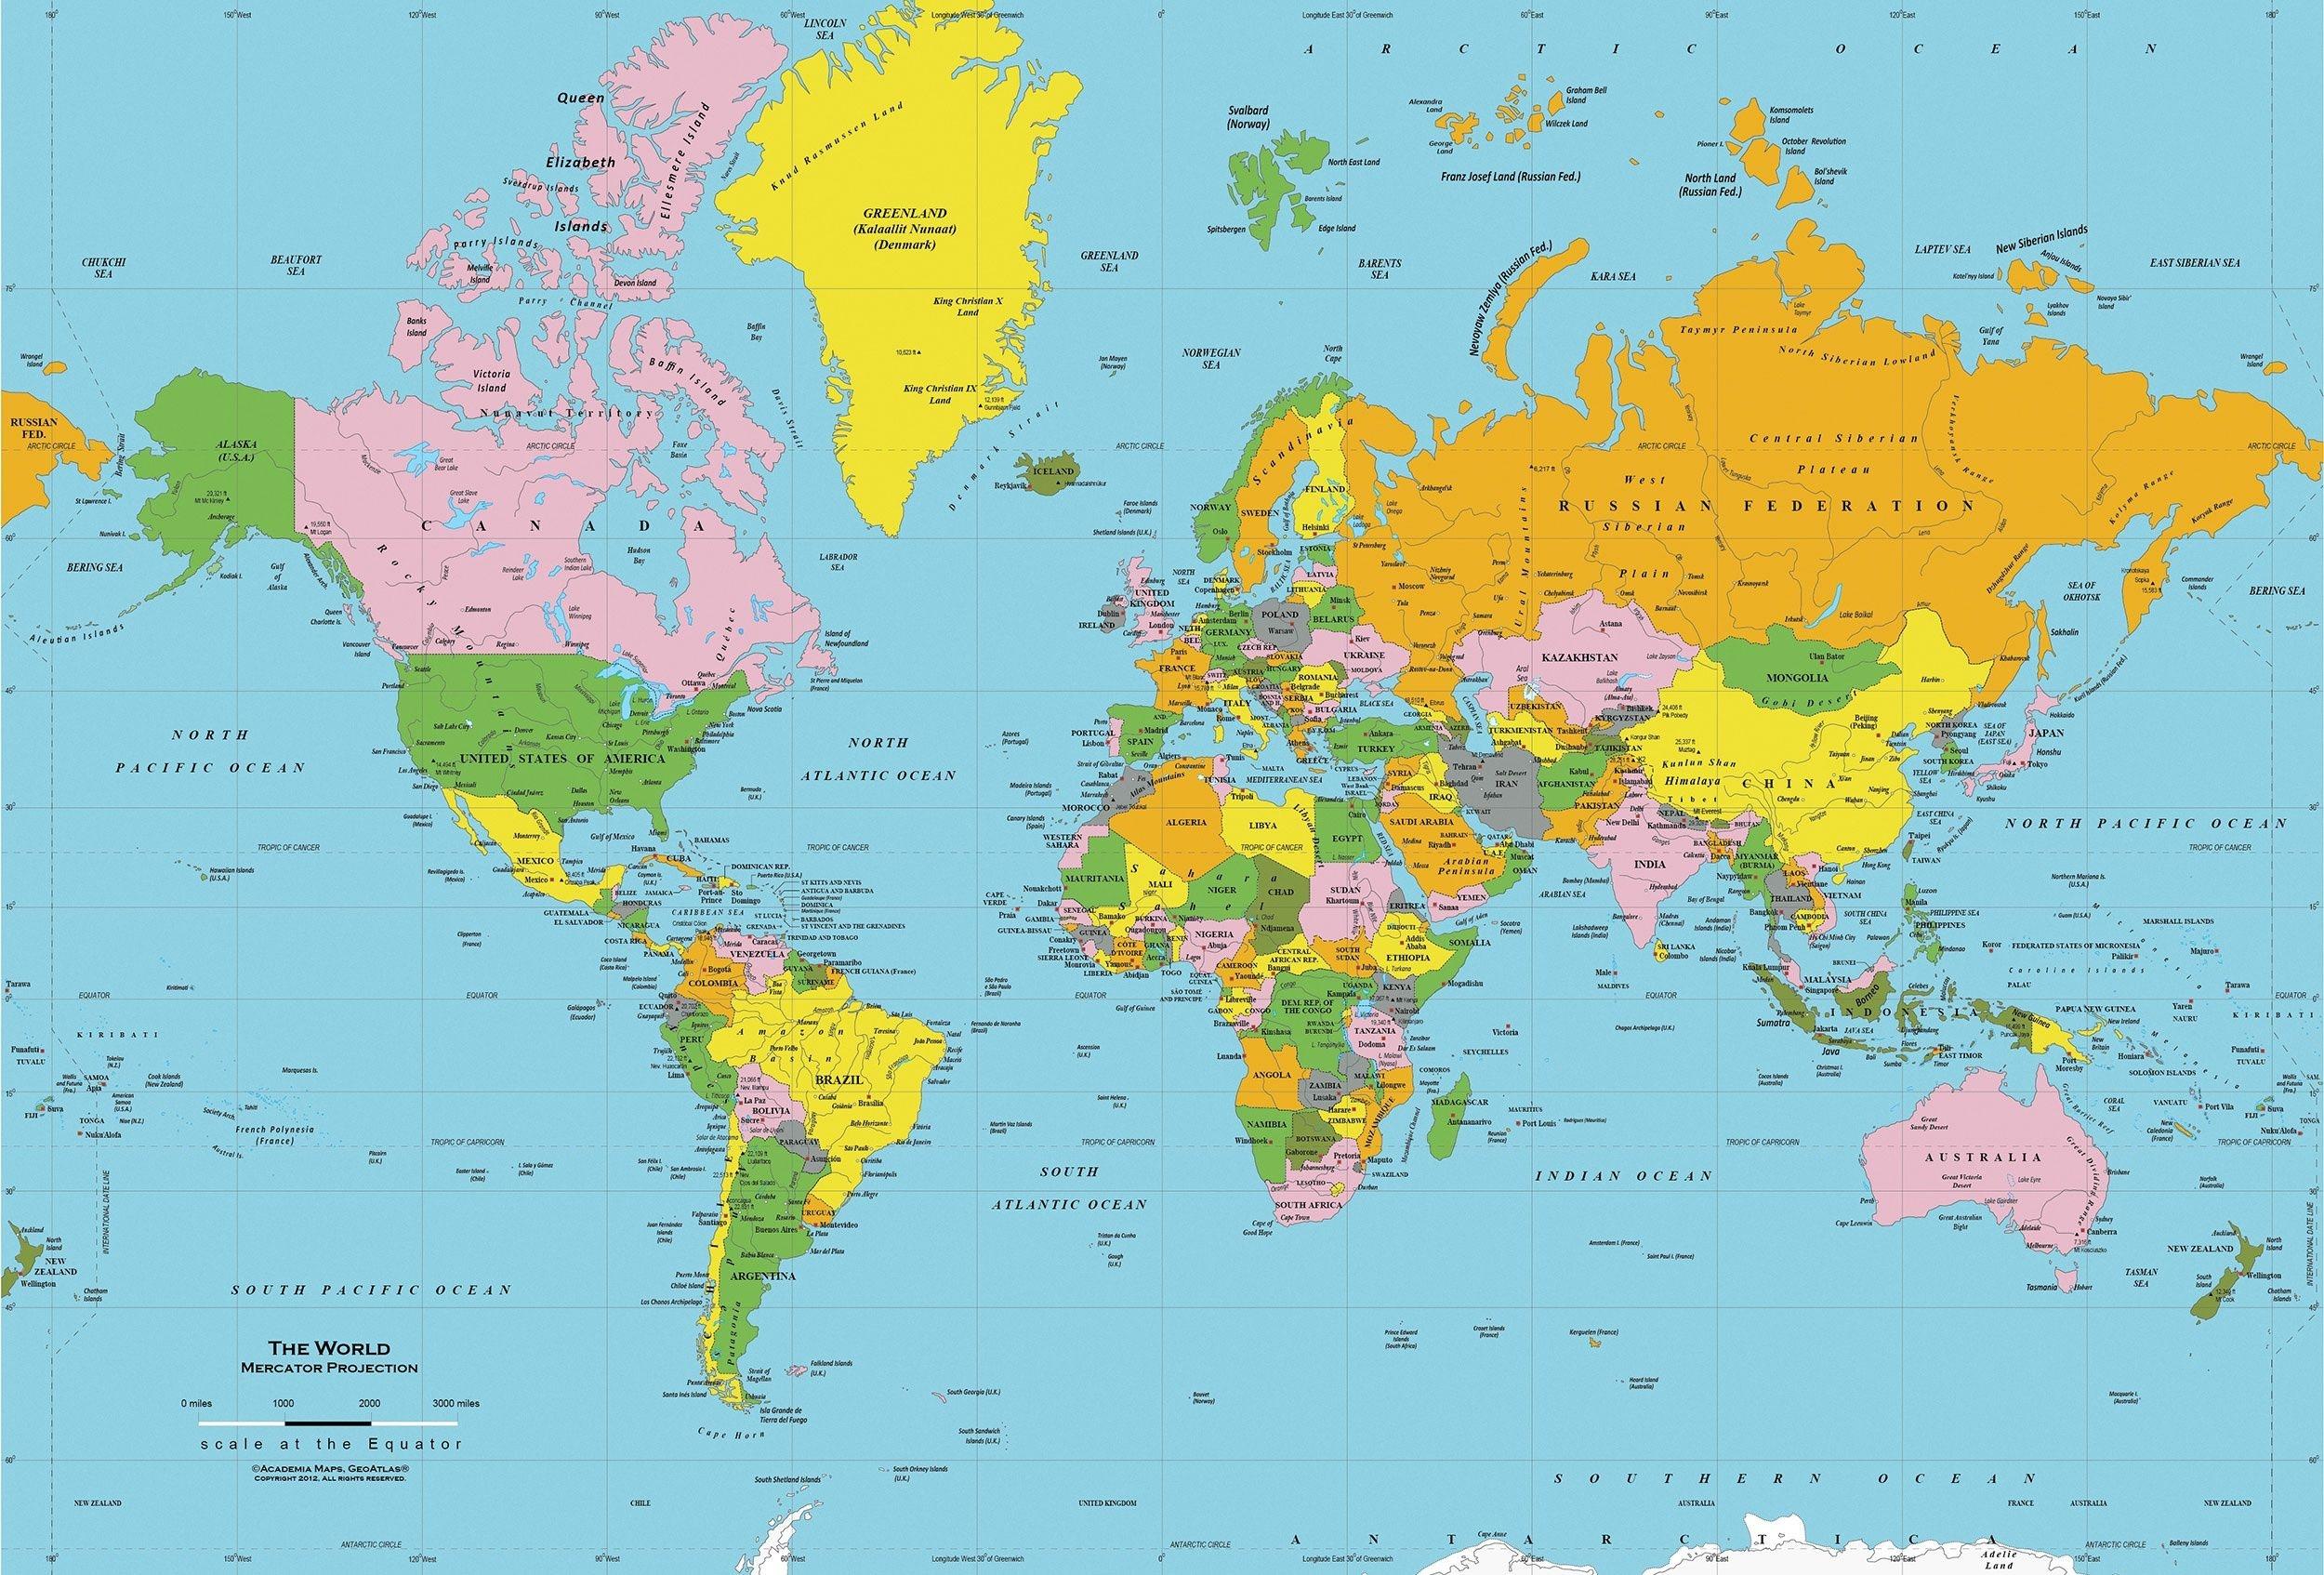 Printable World Map Free | Sitedesignco - Free Printable World Map Images